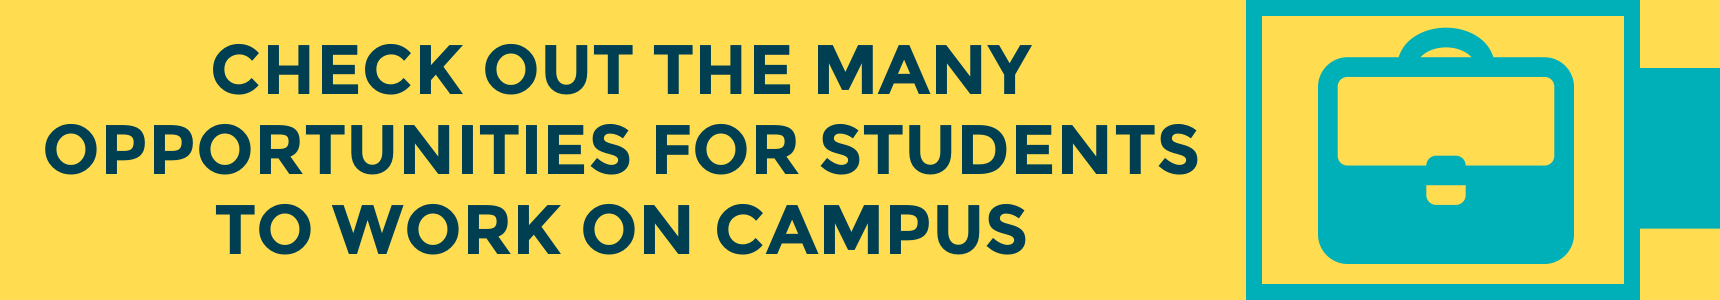 Work On Campus Career Education Thompson Rivers University